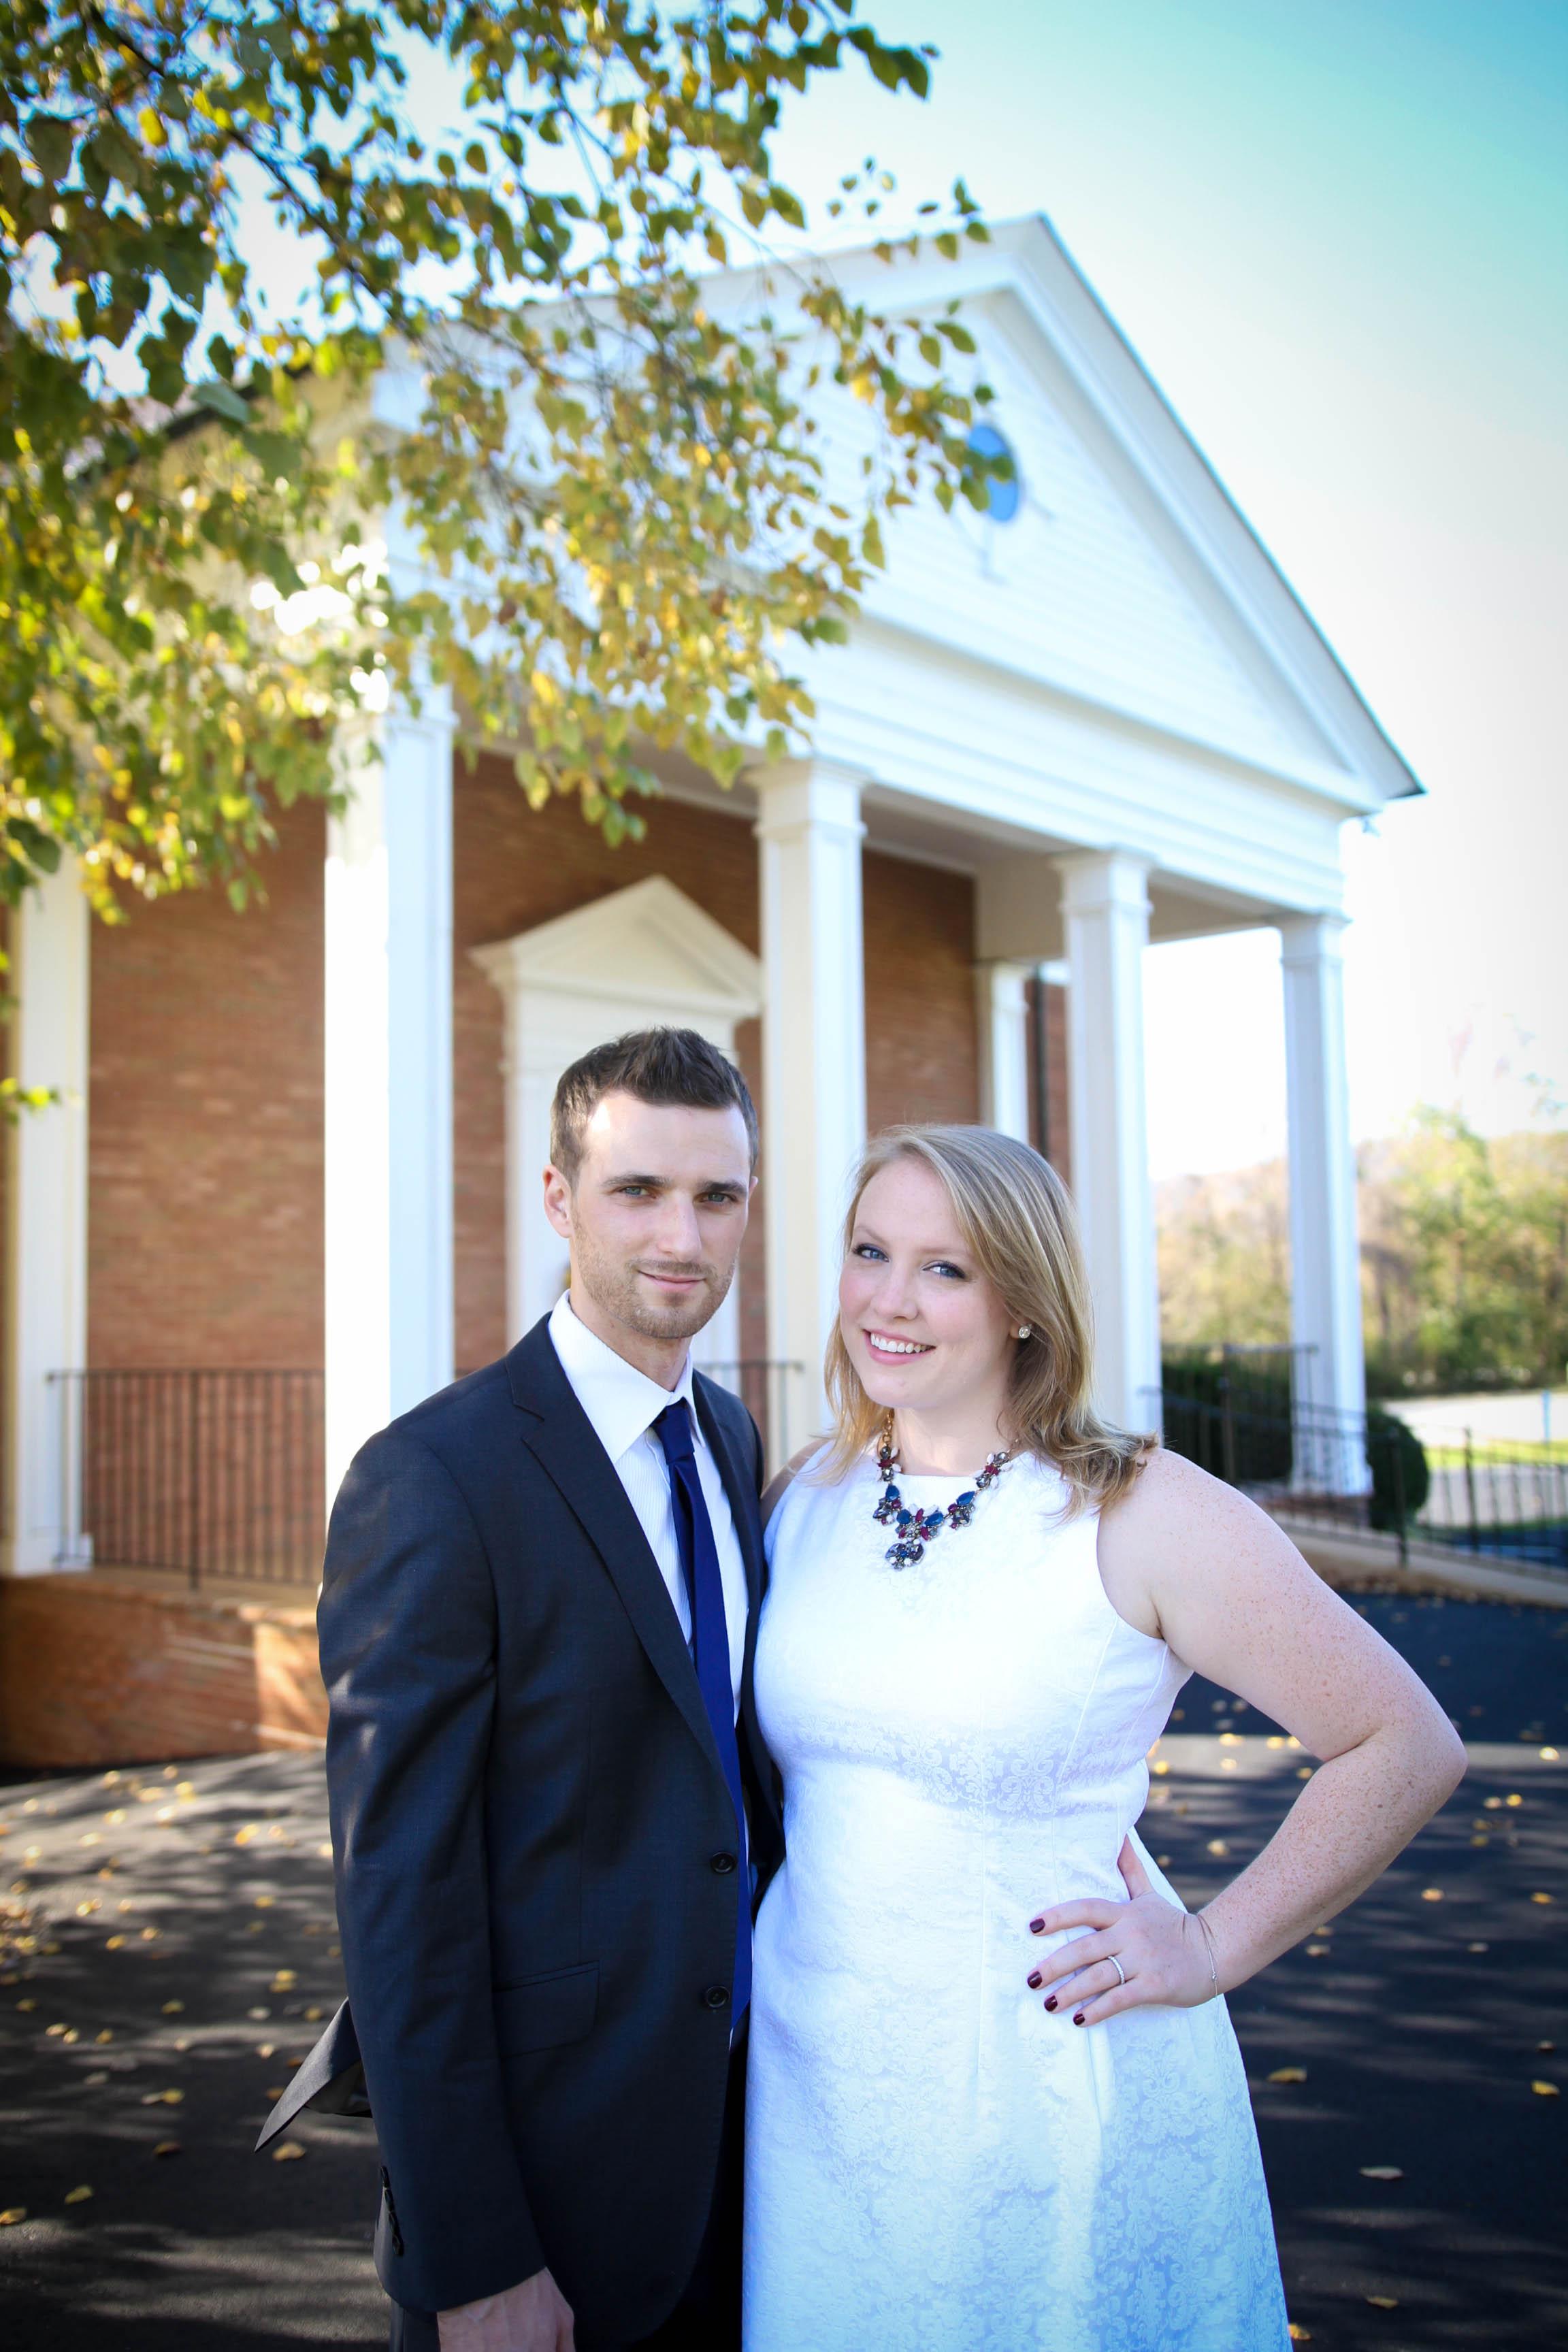 Caitlin & Julien   Maral Noori Photography   Virginia Wedding Elopement Photographer   Lynchburg, Virginia Photographer